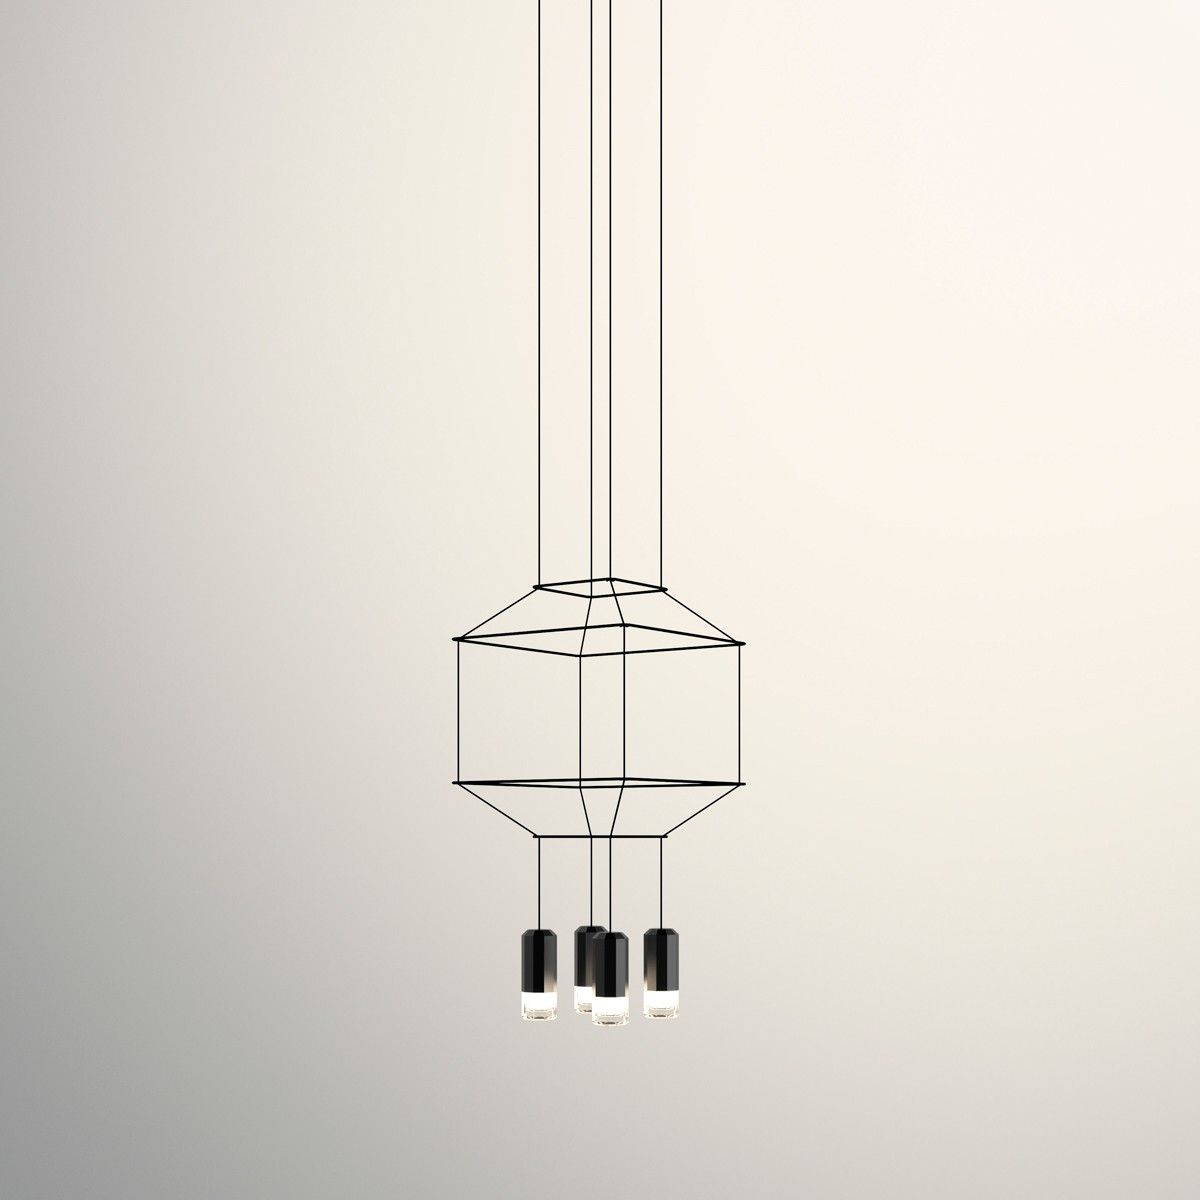 Vibia Wireflow Pendelleuchte, 4-flg., 30 x 30 cm, schwarz